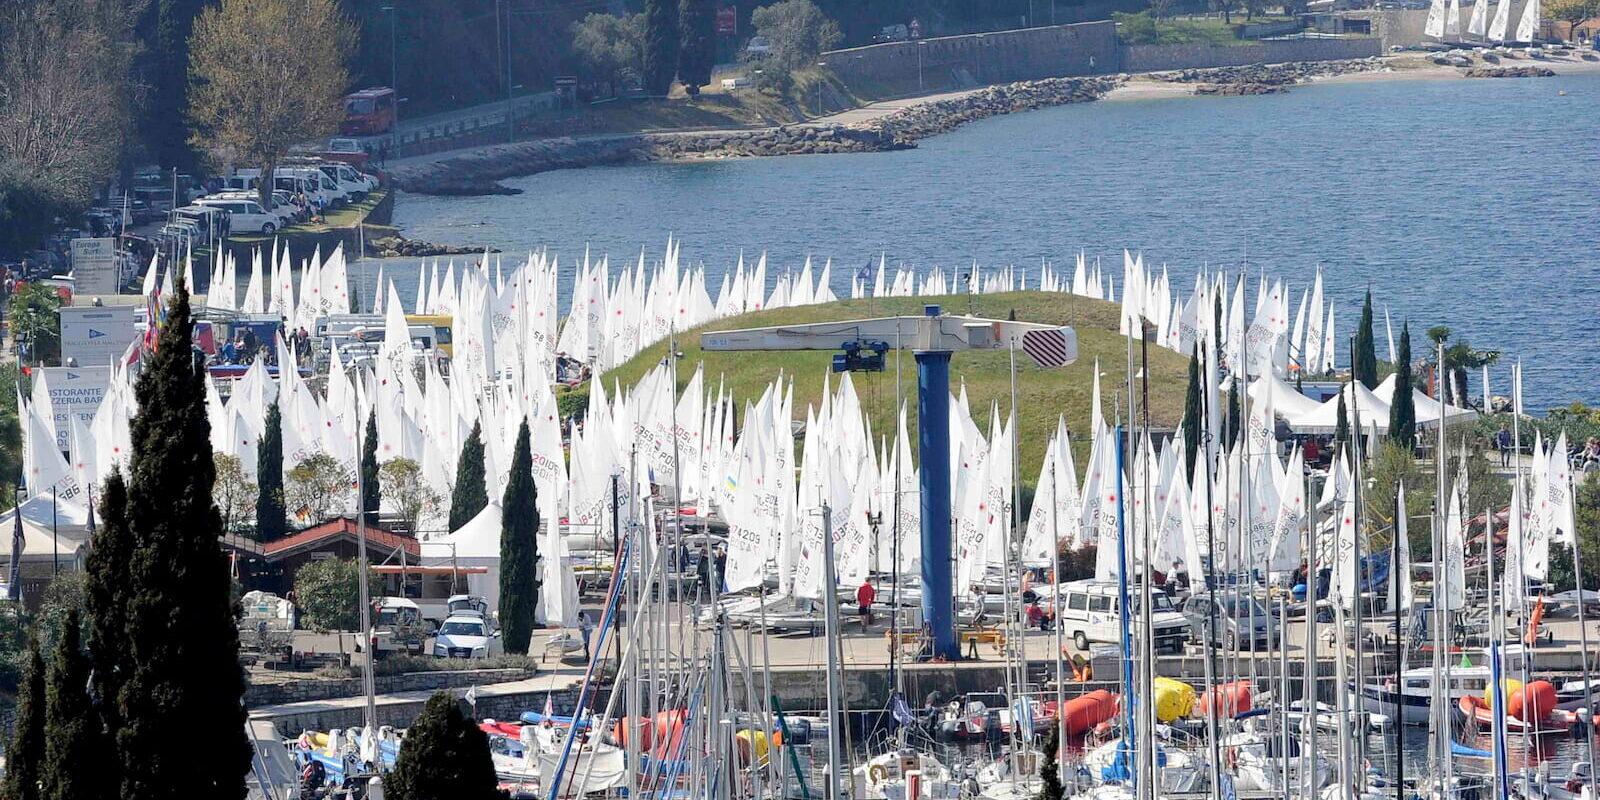 Meeting Regate Fraglia Vela Malcesine Lago di Garda